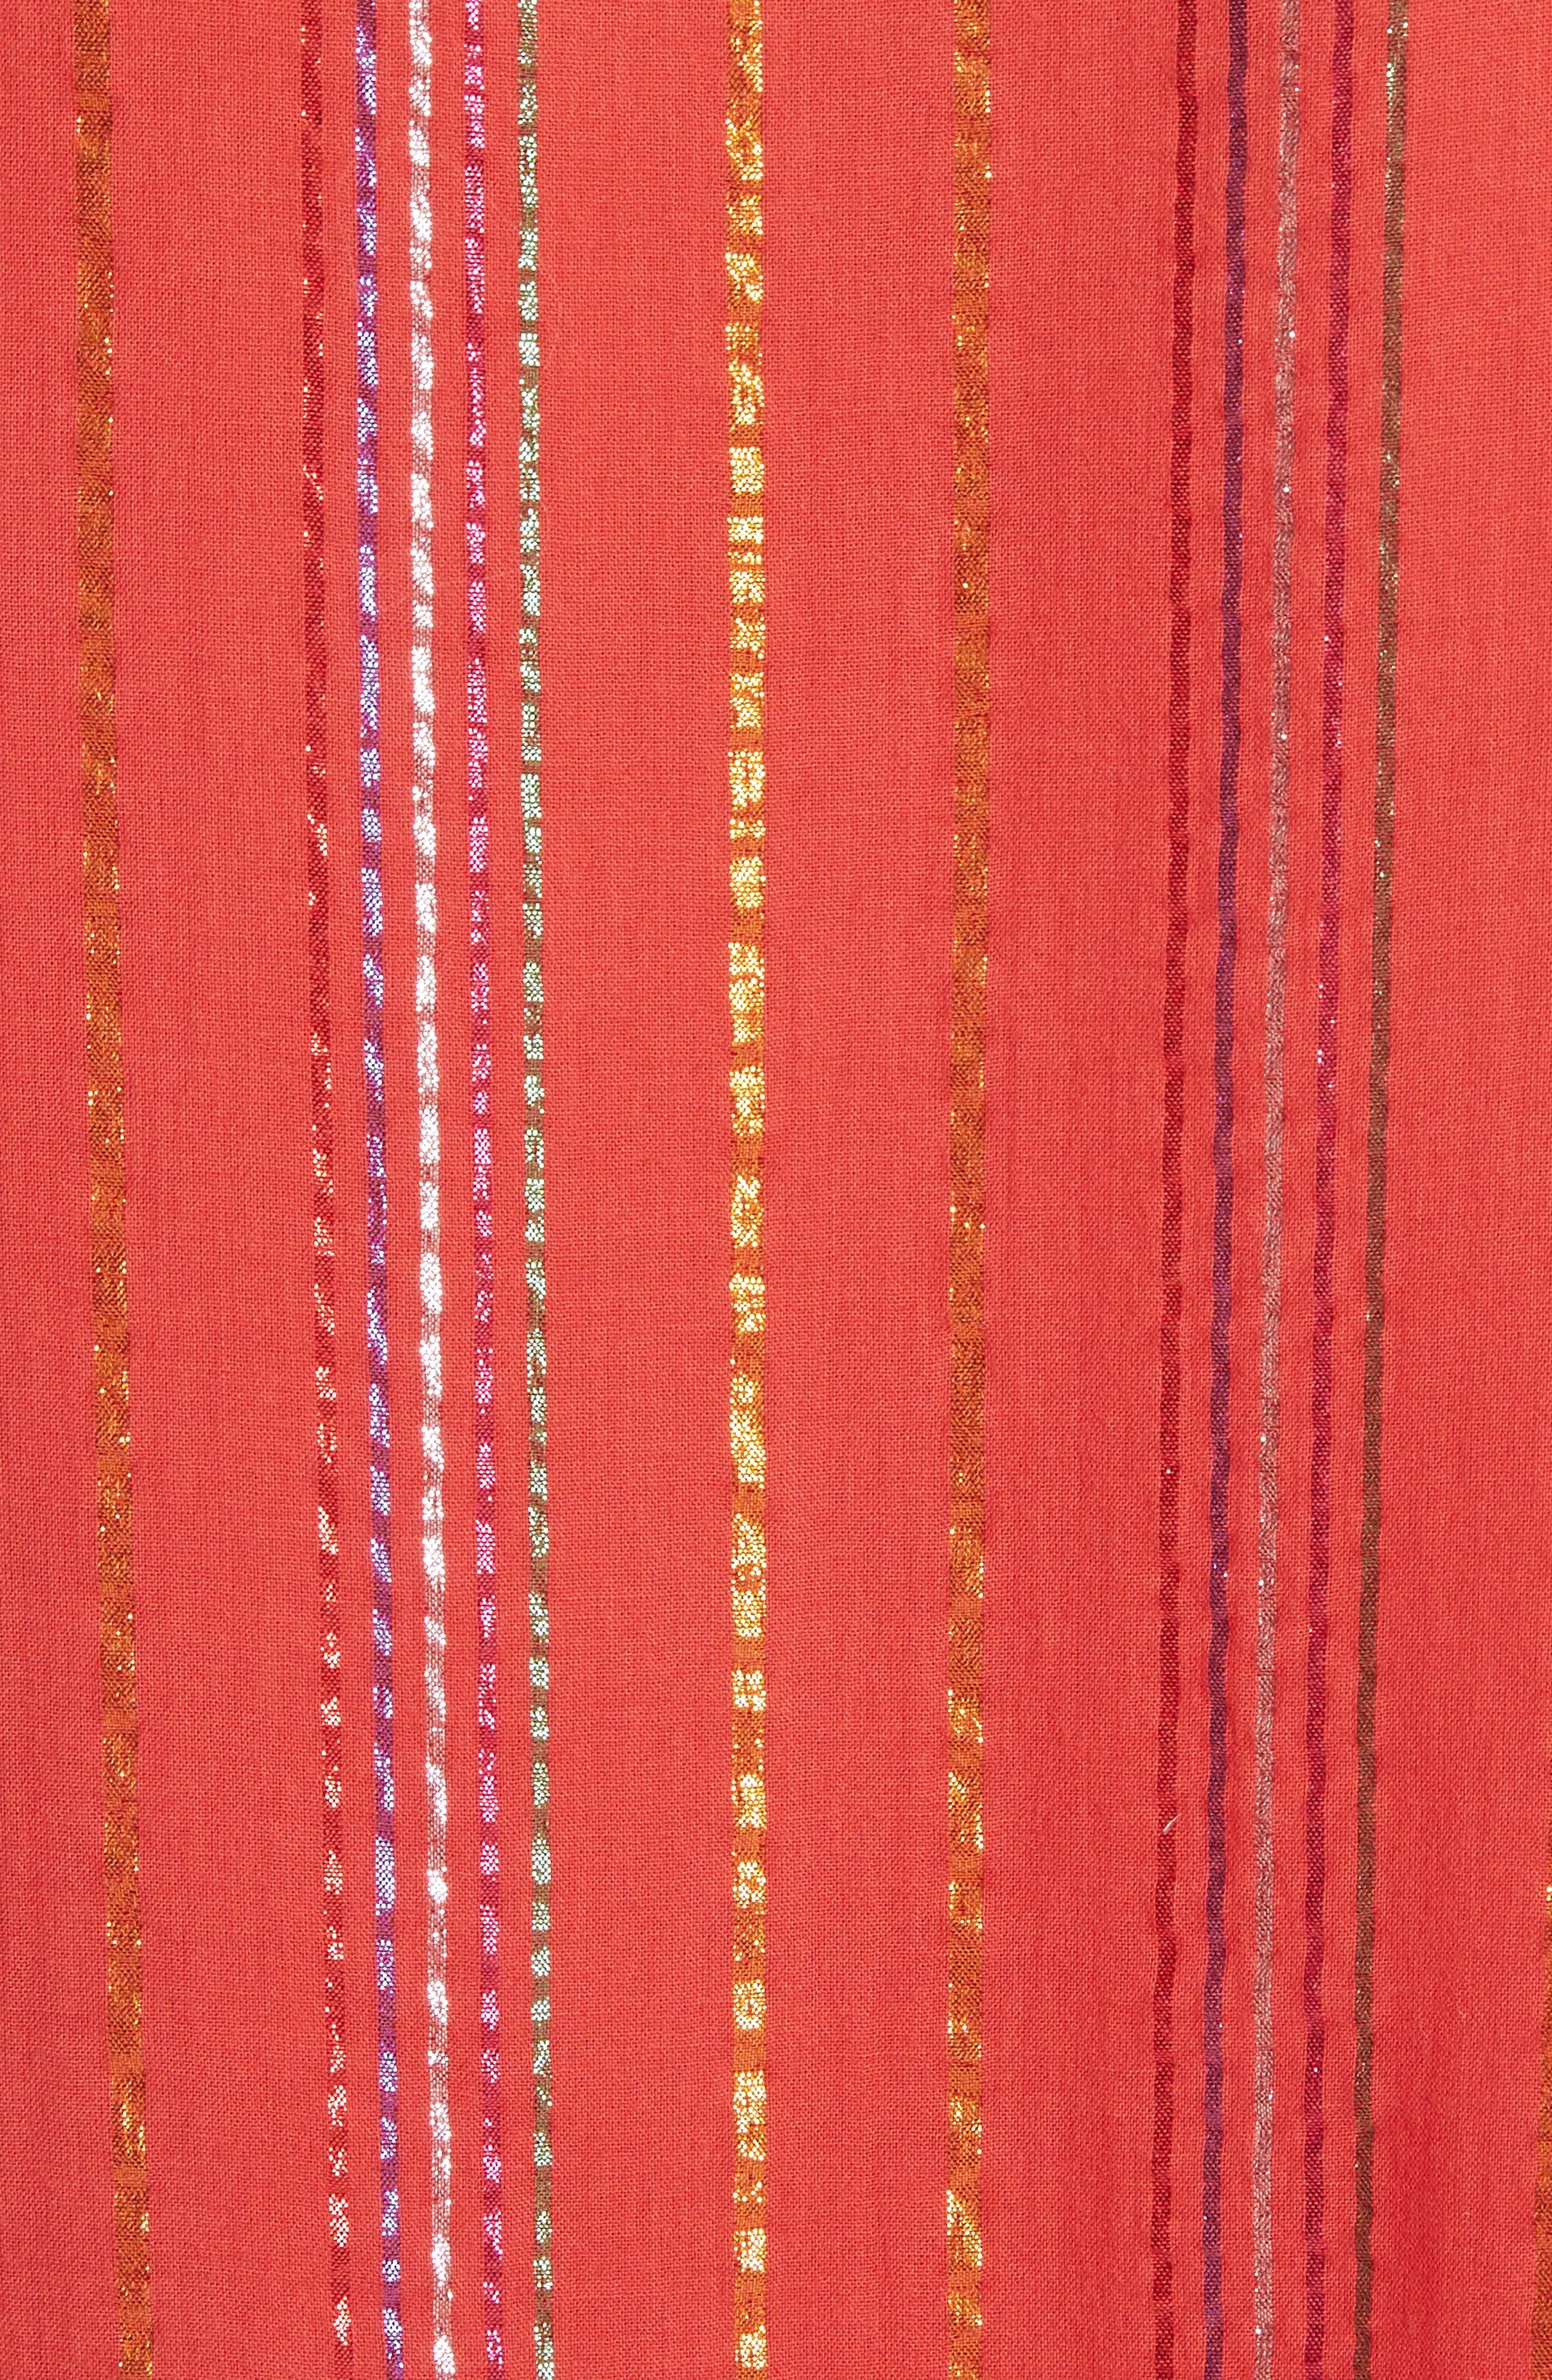 Los Altos Midi Dress,                             Alternate thumbnail 5, color,